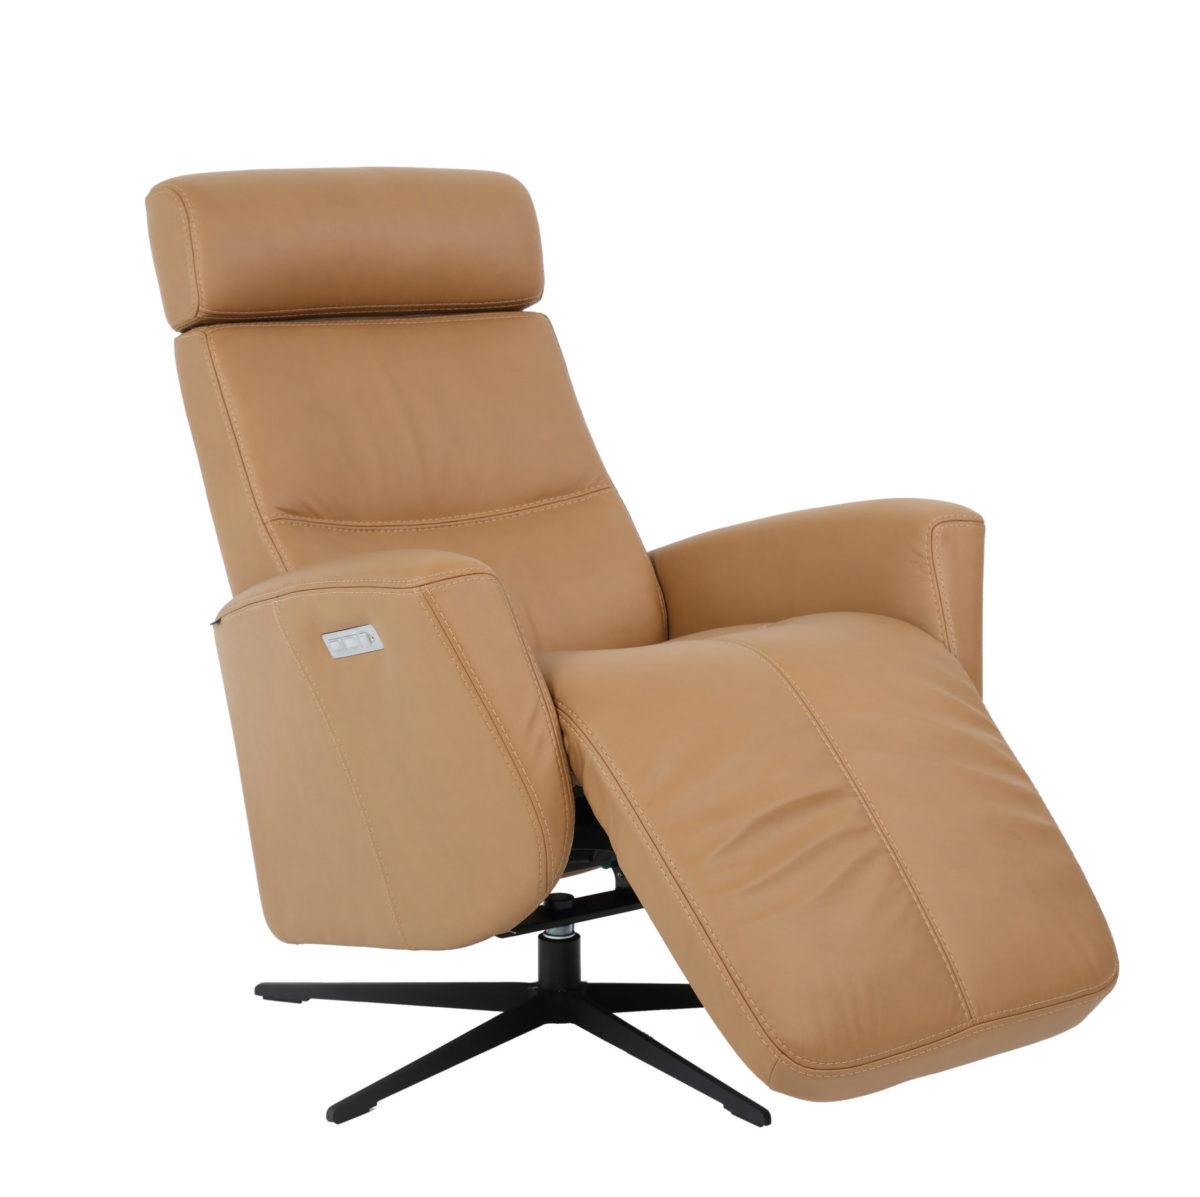 Magnus David Chase Furniture And Design